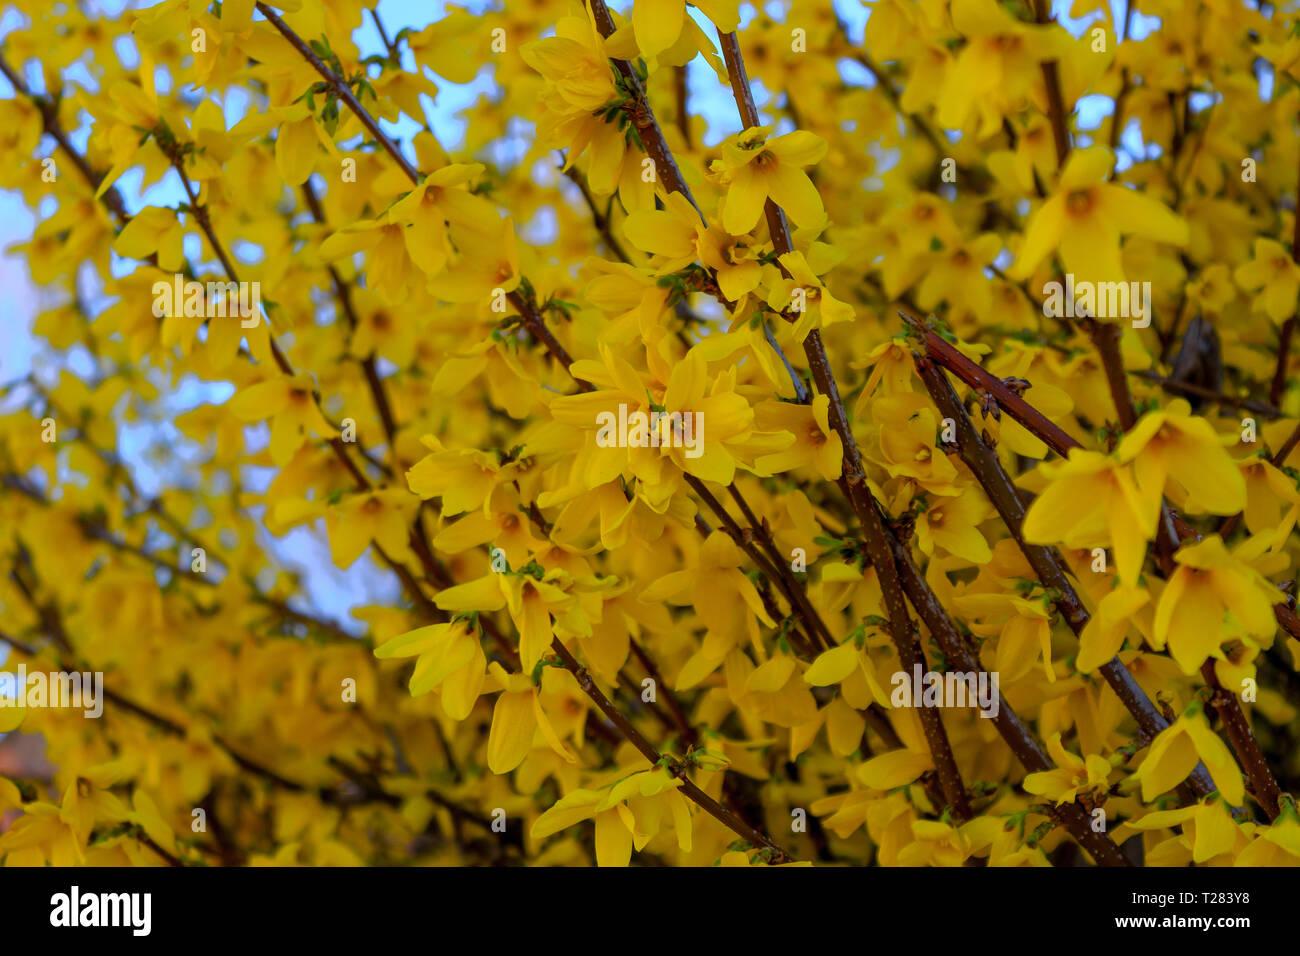 Forsythia Bushes Spring Yellow Flowers Of Forsythia Bush Stock